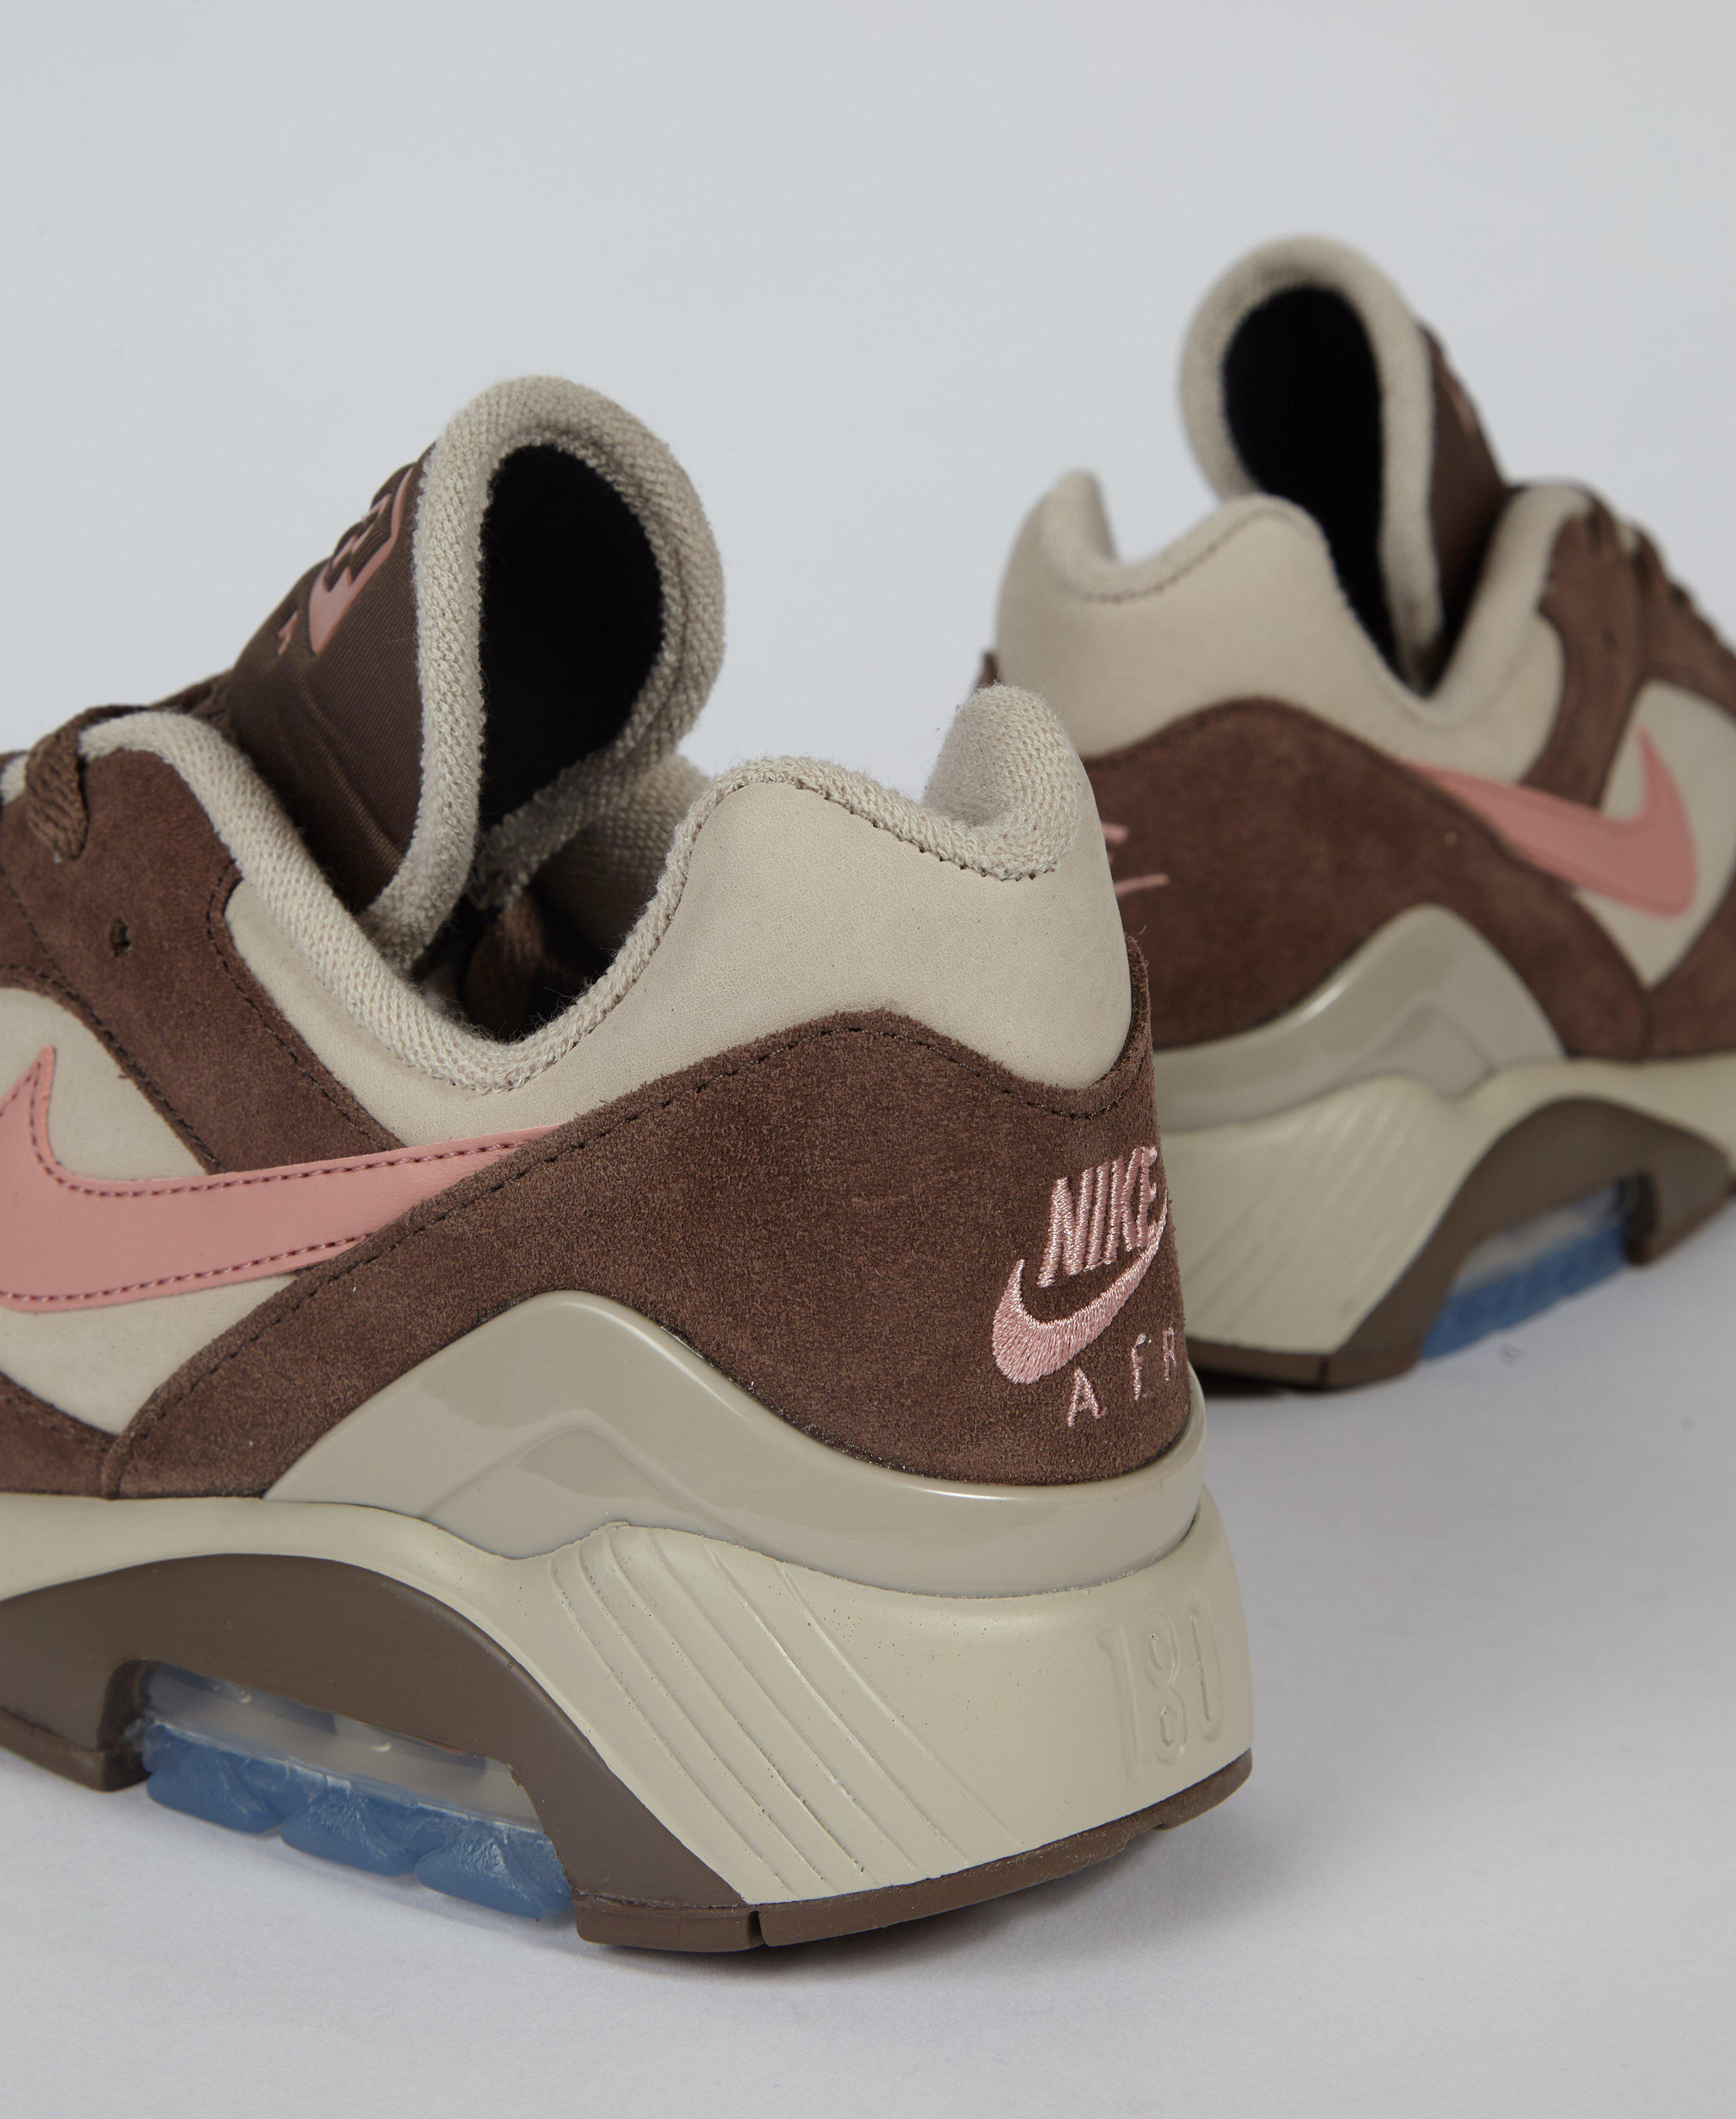 san francisco 0de01 acc77 Nike Air Max 180 String   Pink   Brown in Brown for Men - Lyst